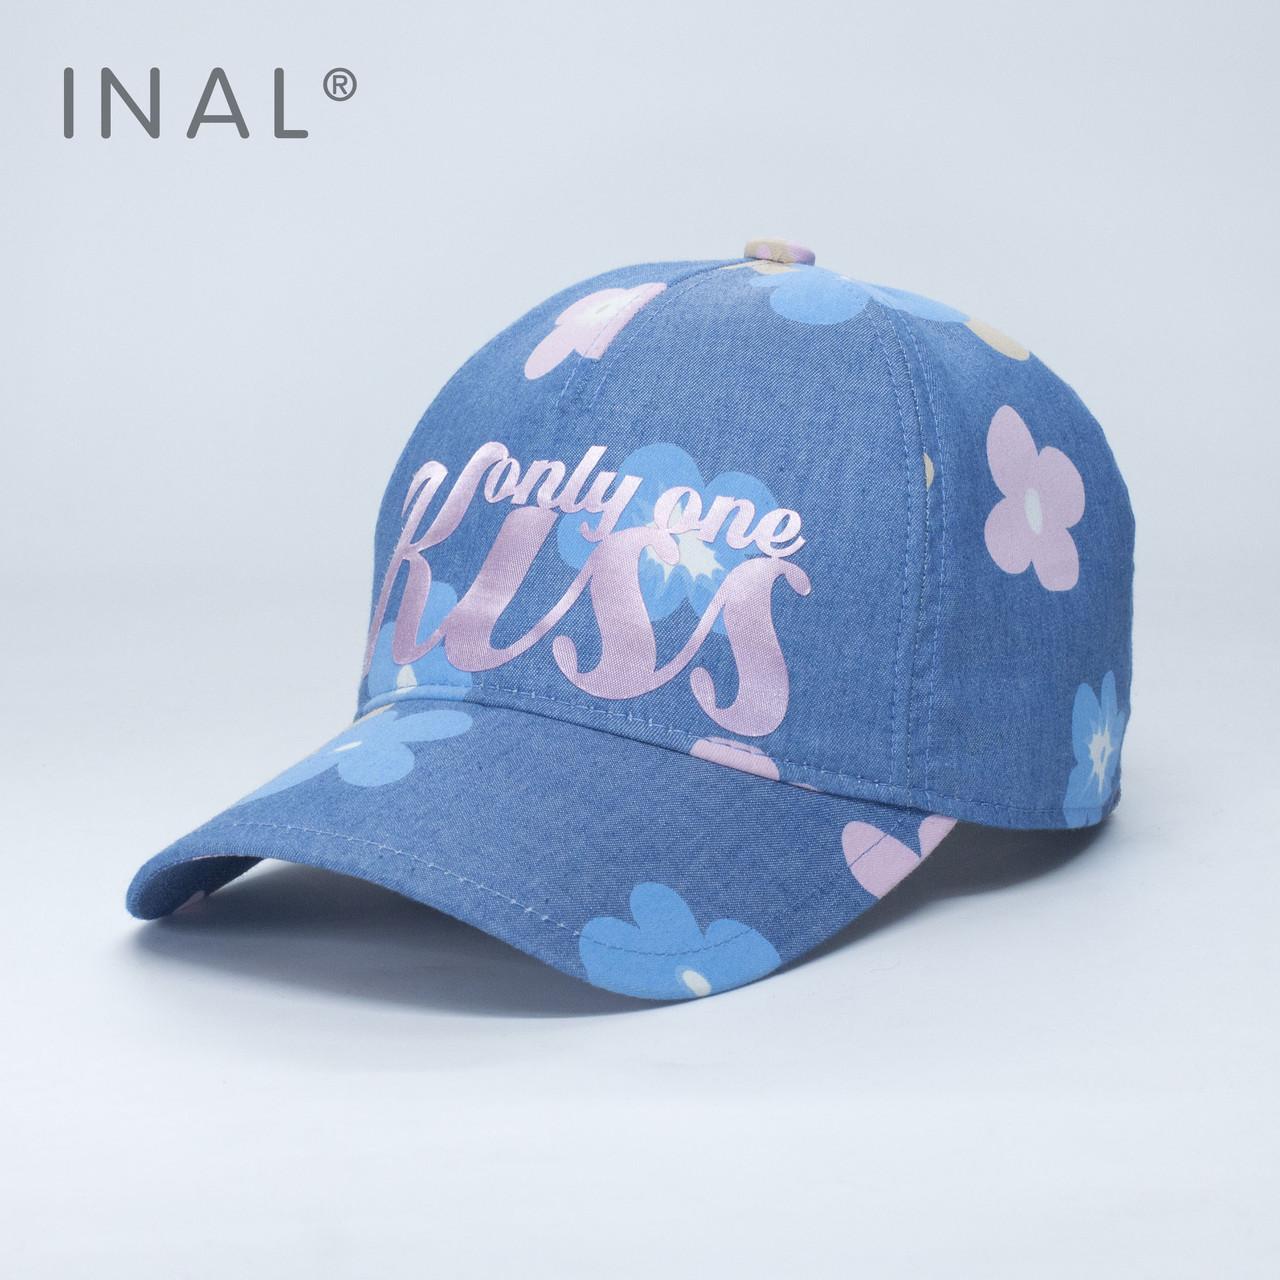 Кепка бейсболка INAL Kiss M / 55-56 RU Синий 172155